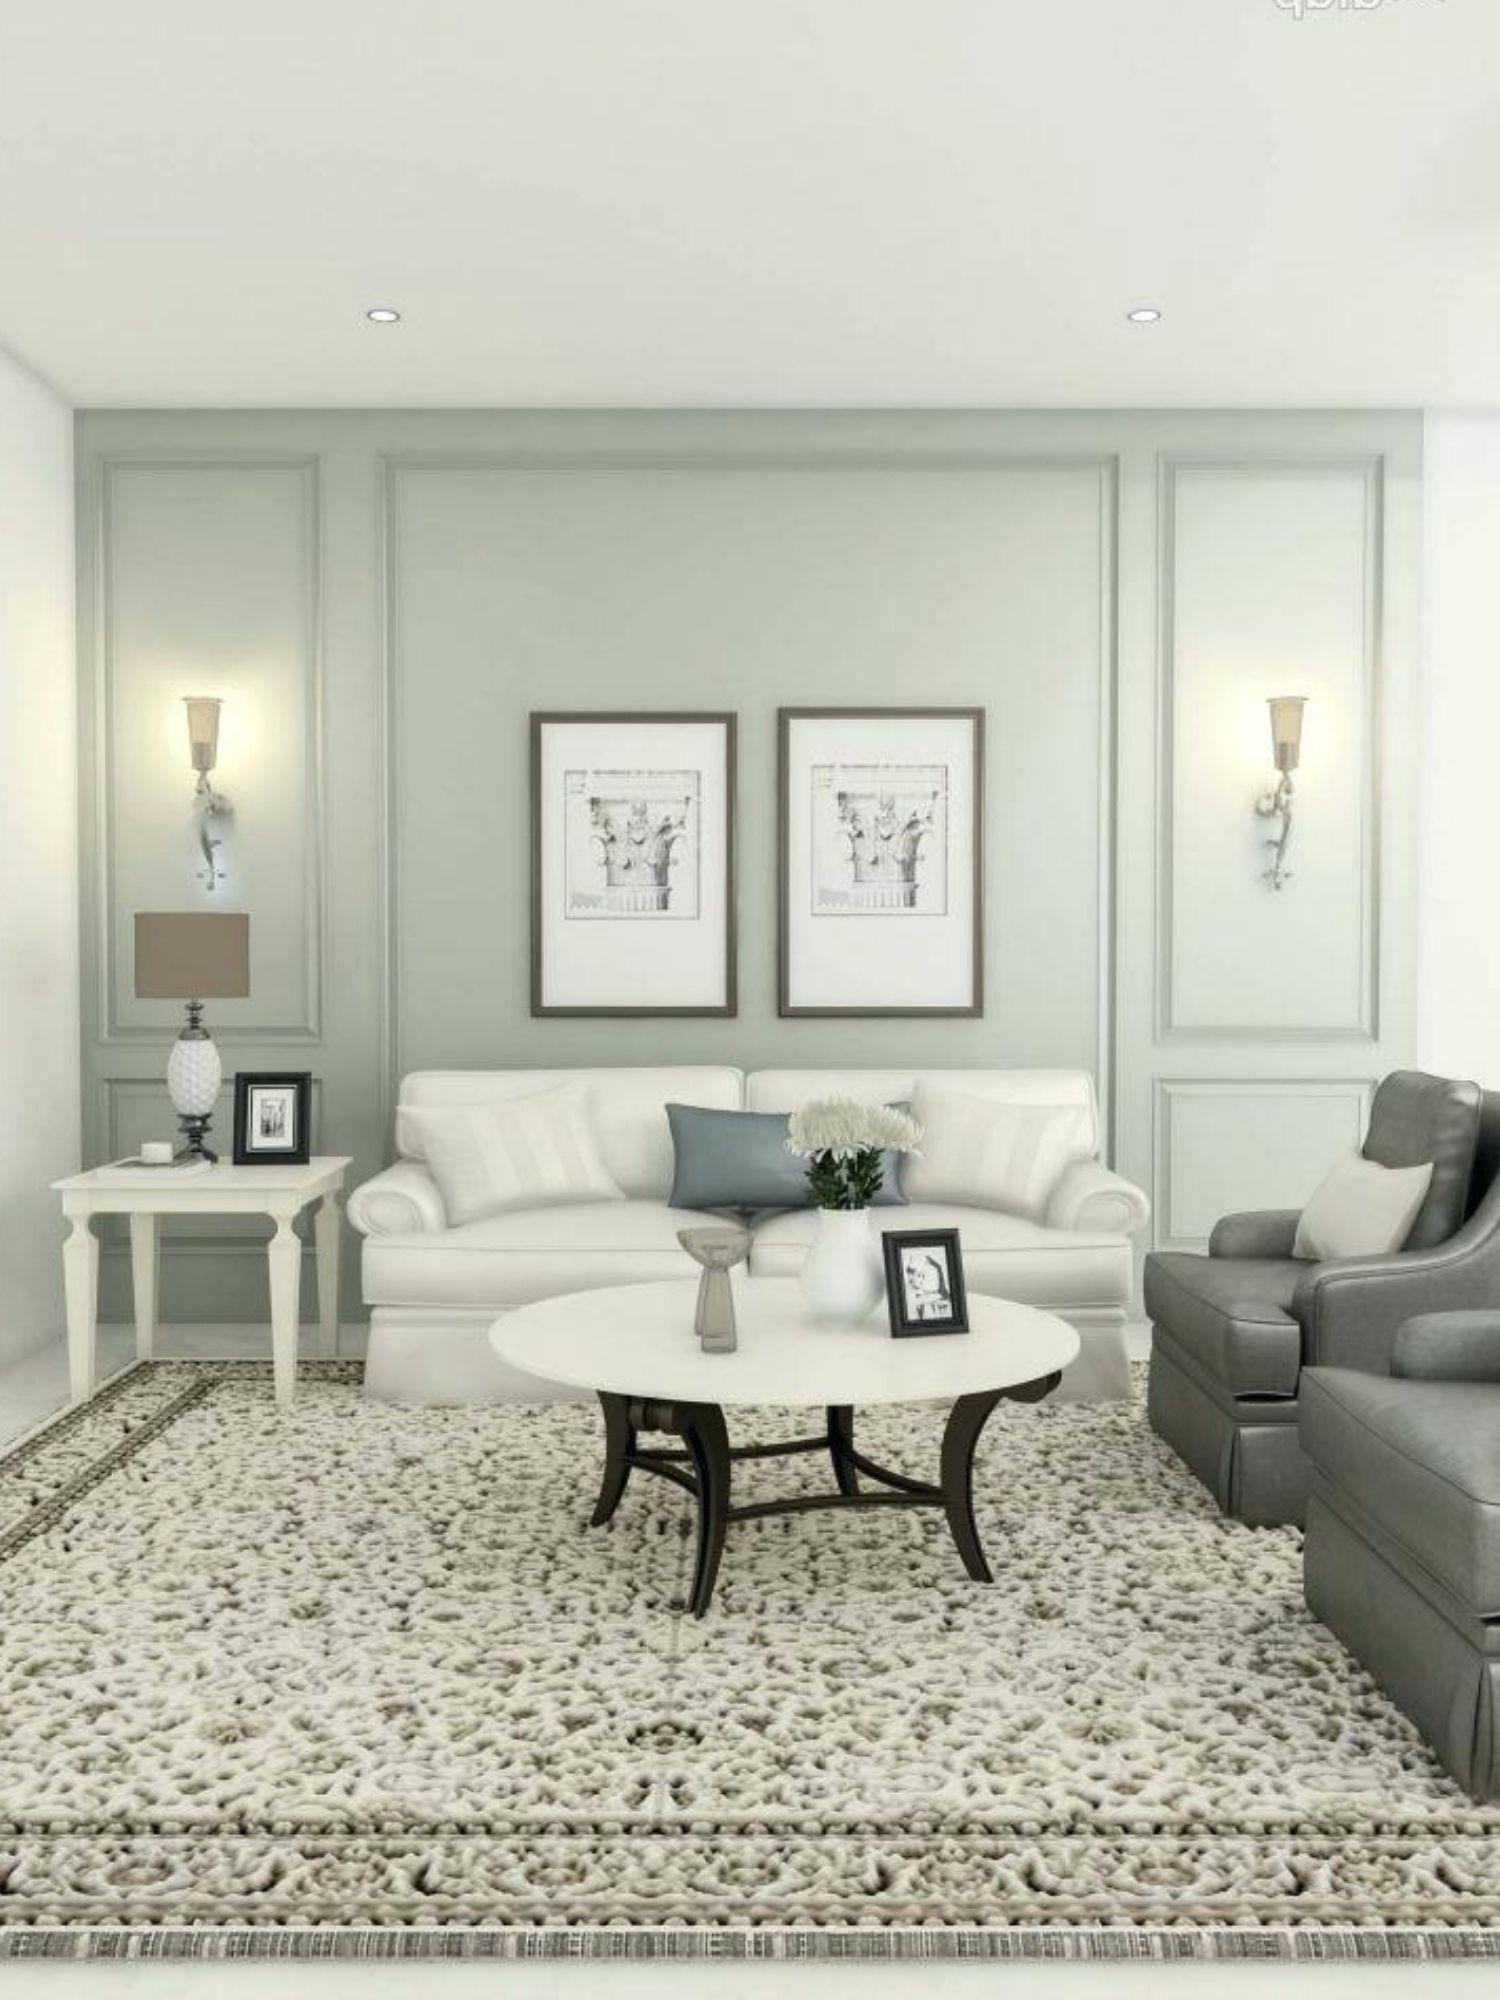 Top 7 Modern Interior Design Concepts Interior Design Interior Design Concepts Modern Interior